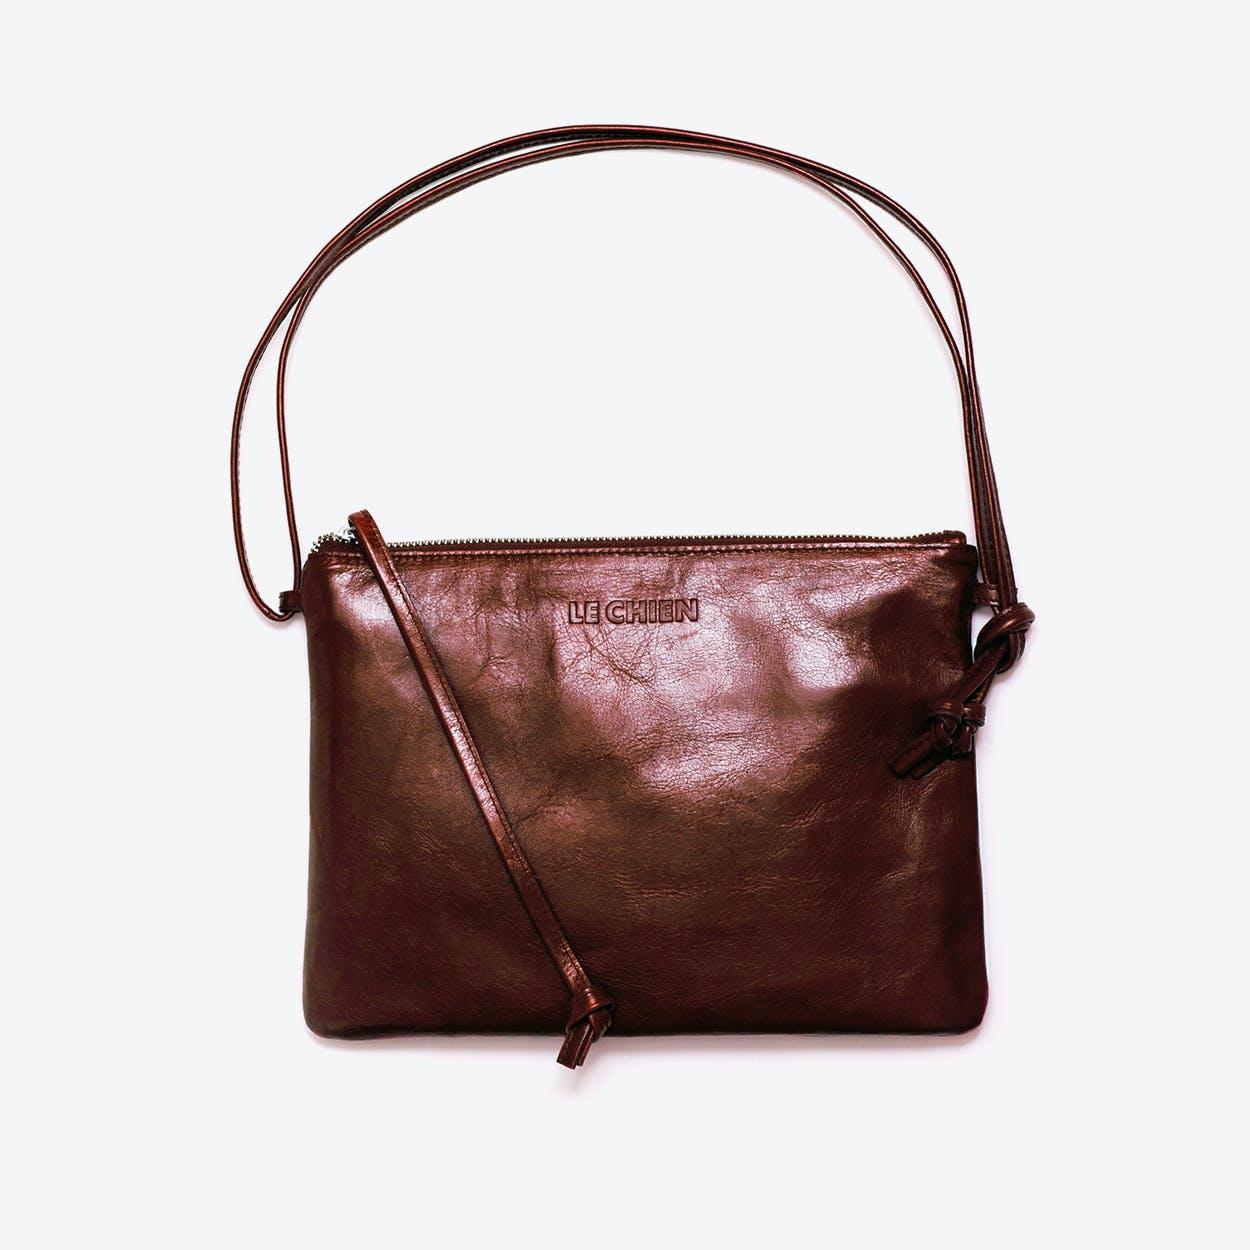 Pinscher Crossbody Bag in Chestnut/Shine